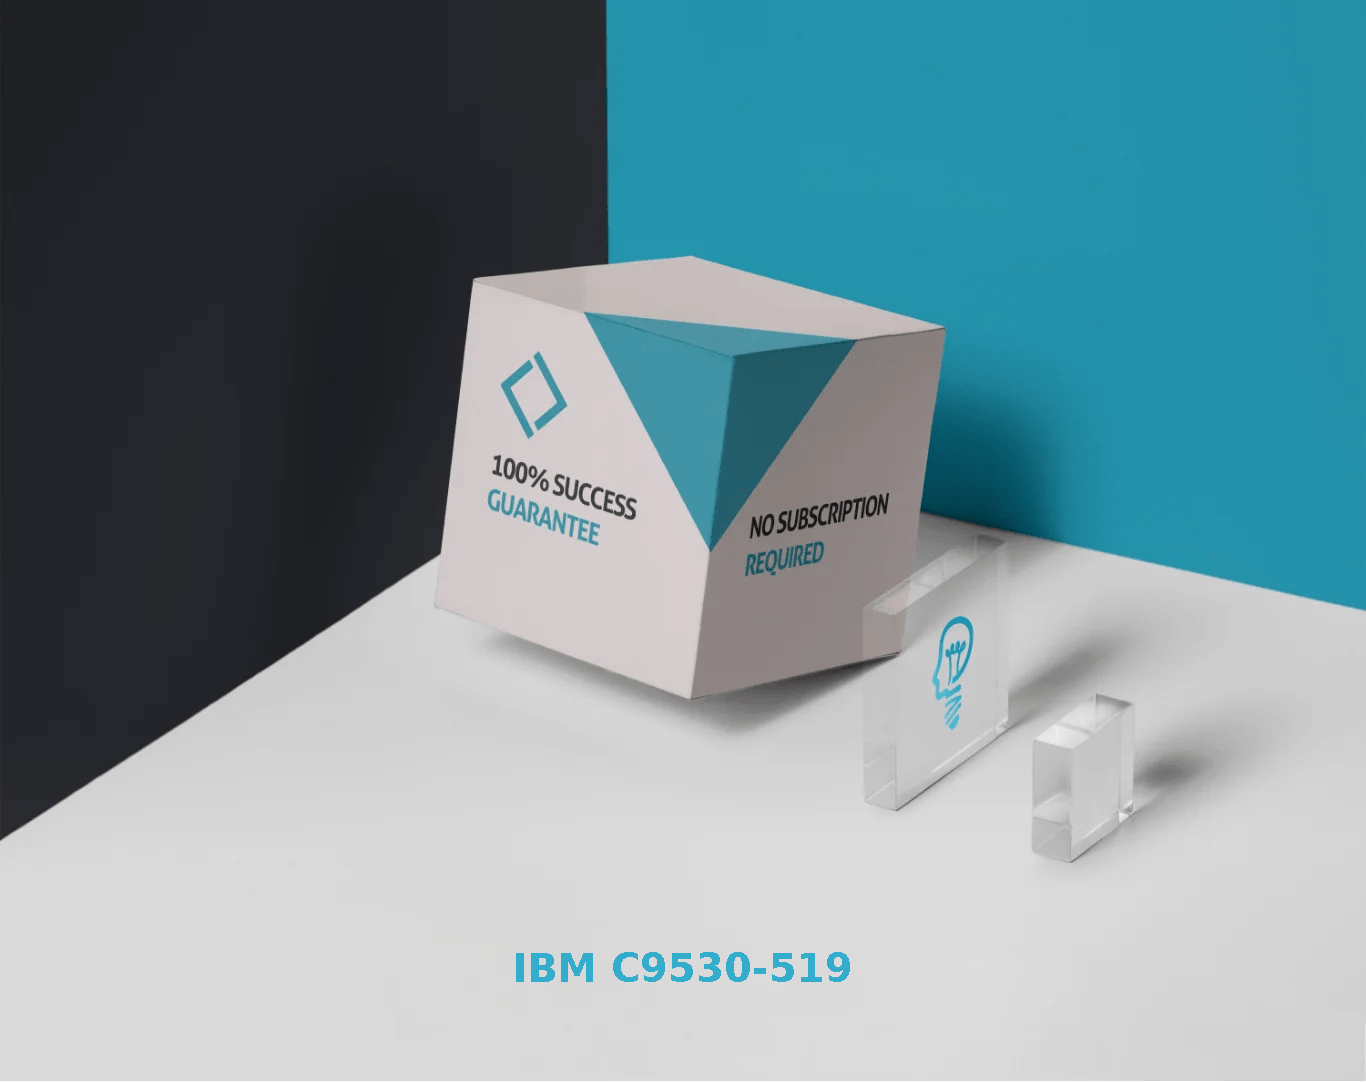 IBM C9530-519 Exams